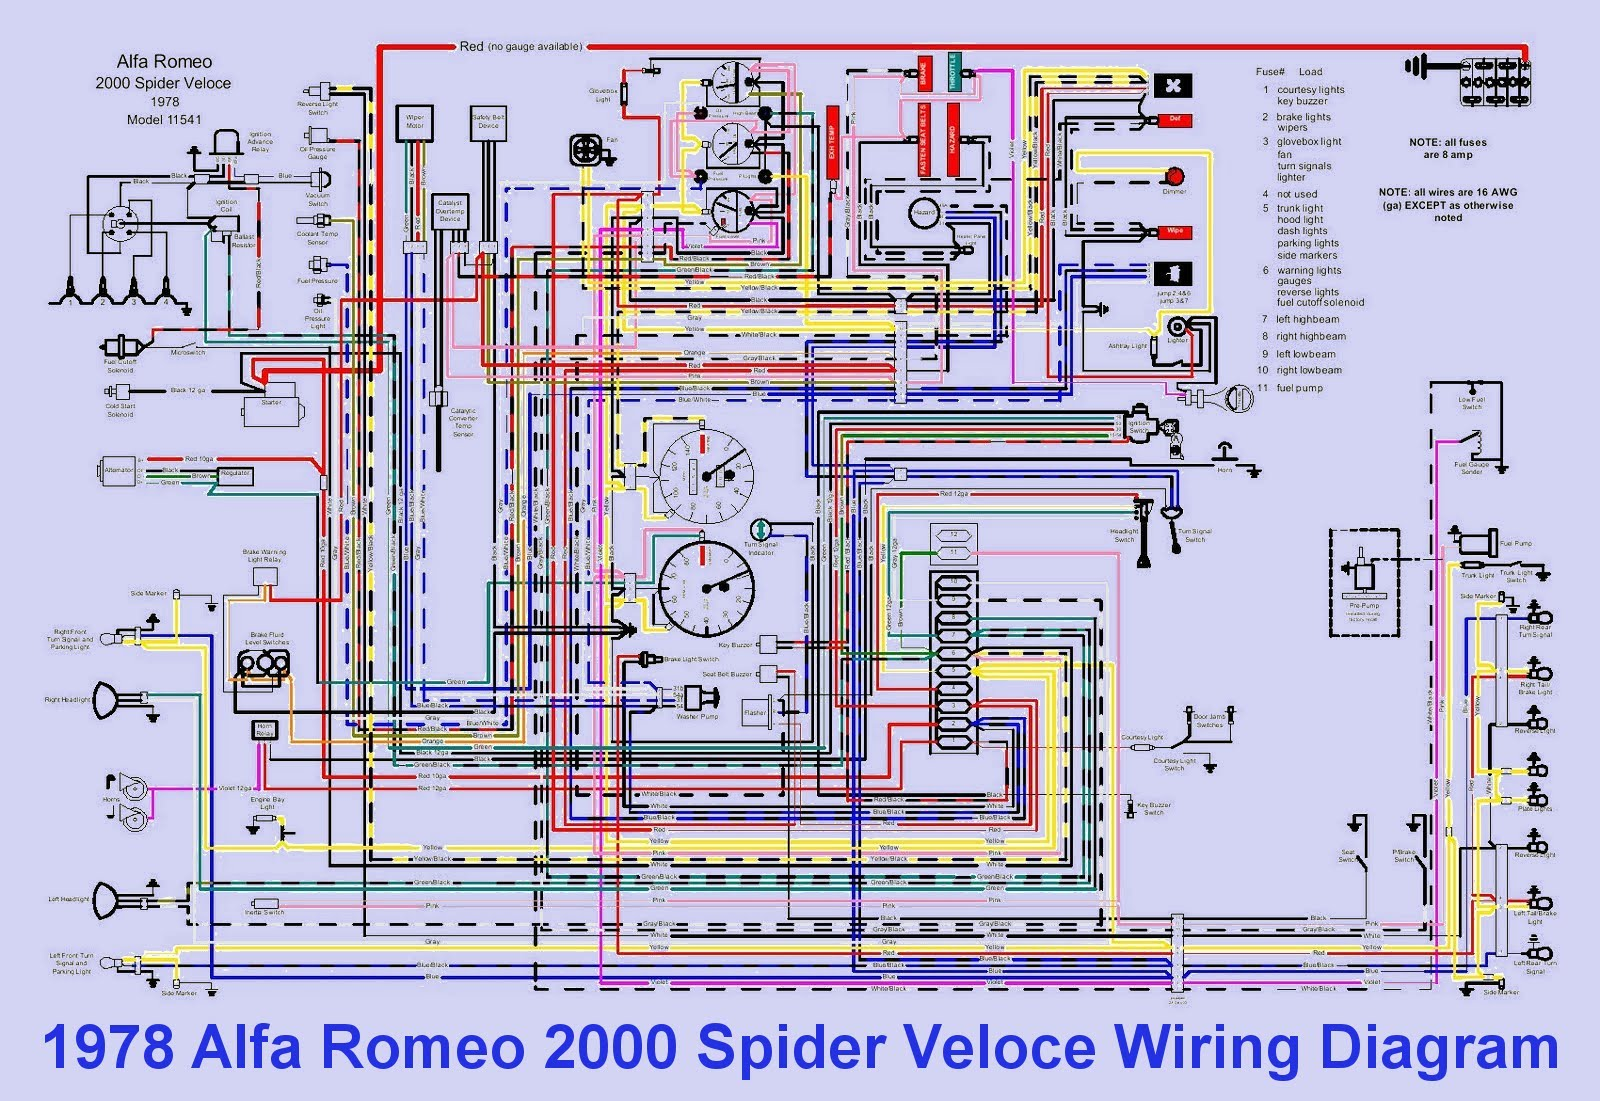 wiring diagram alfa romeo spider wiring diagram 1960 rolls royce wiring diagram 1960 rolls royce wiring diagram [ 1600 x 1101 Pixel ]